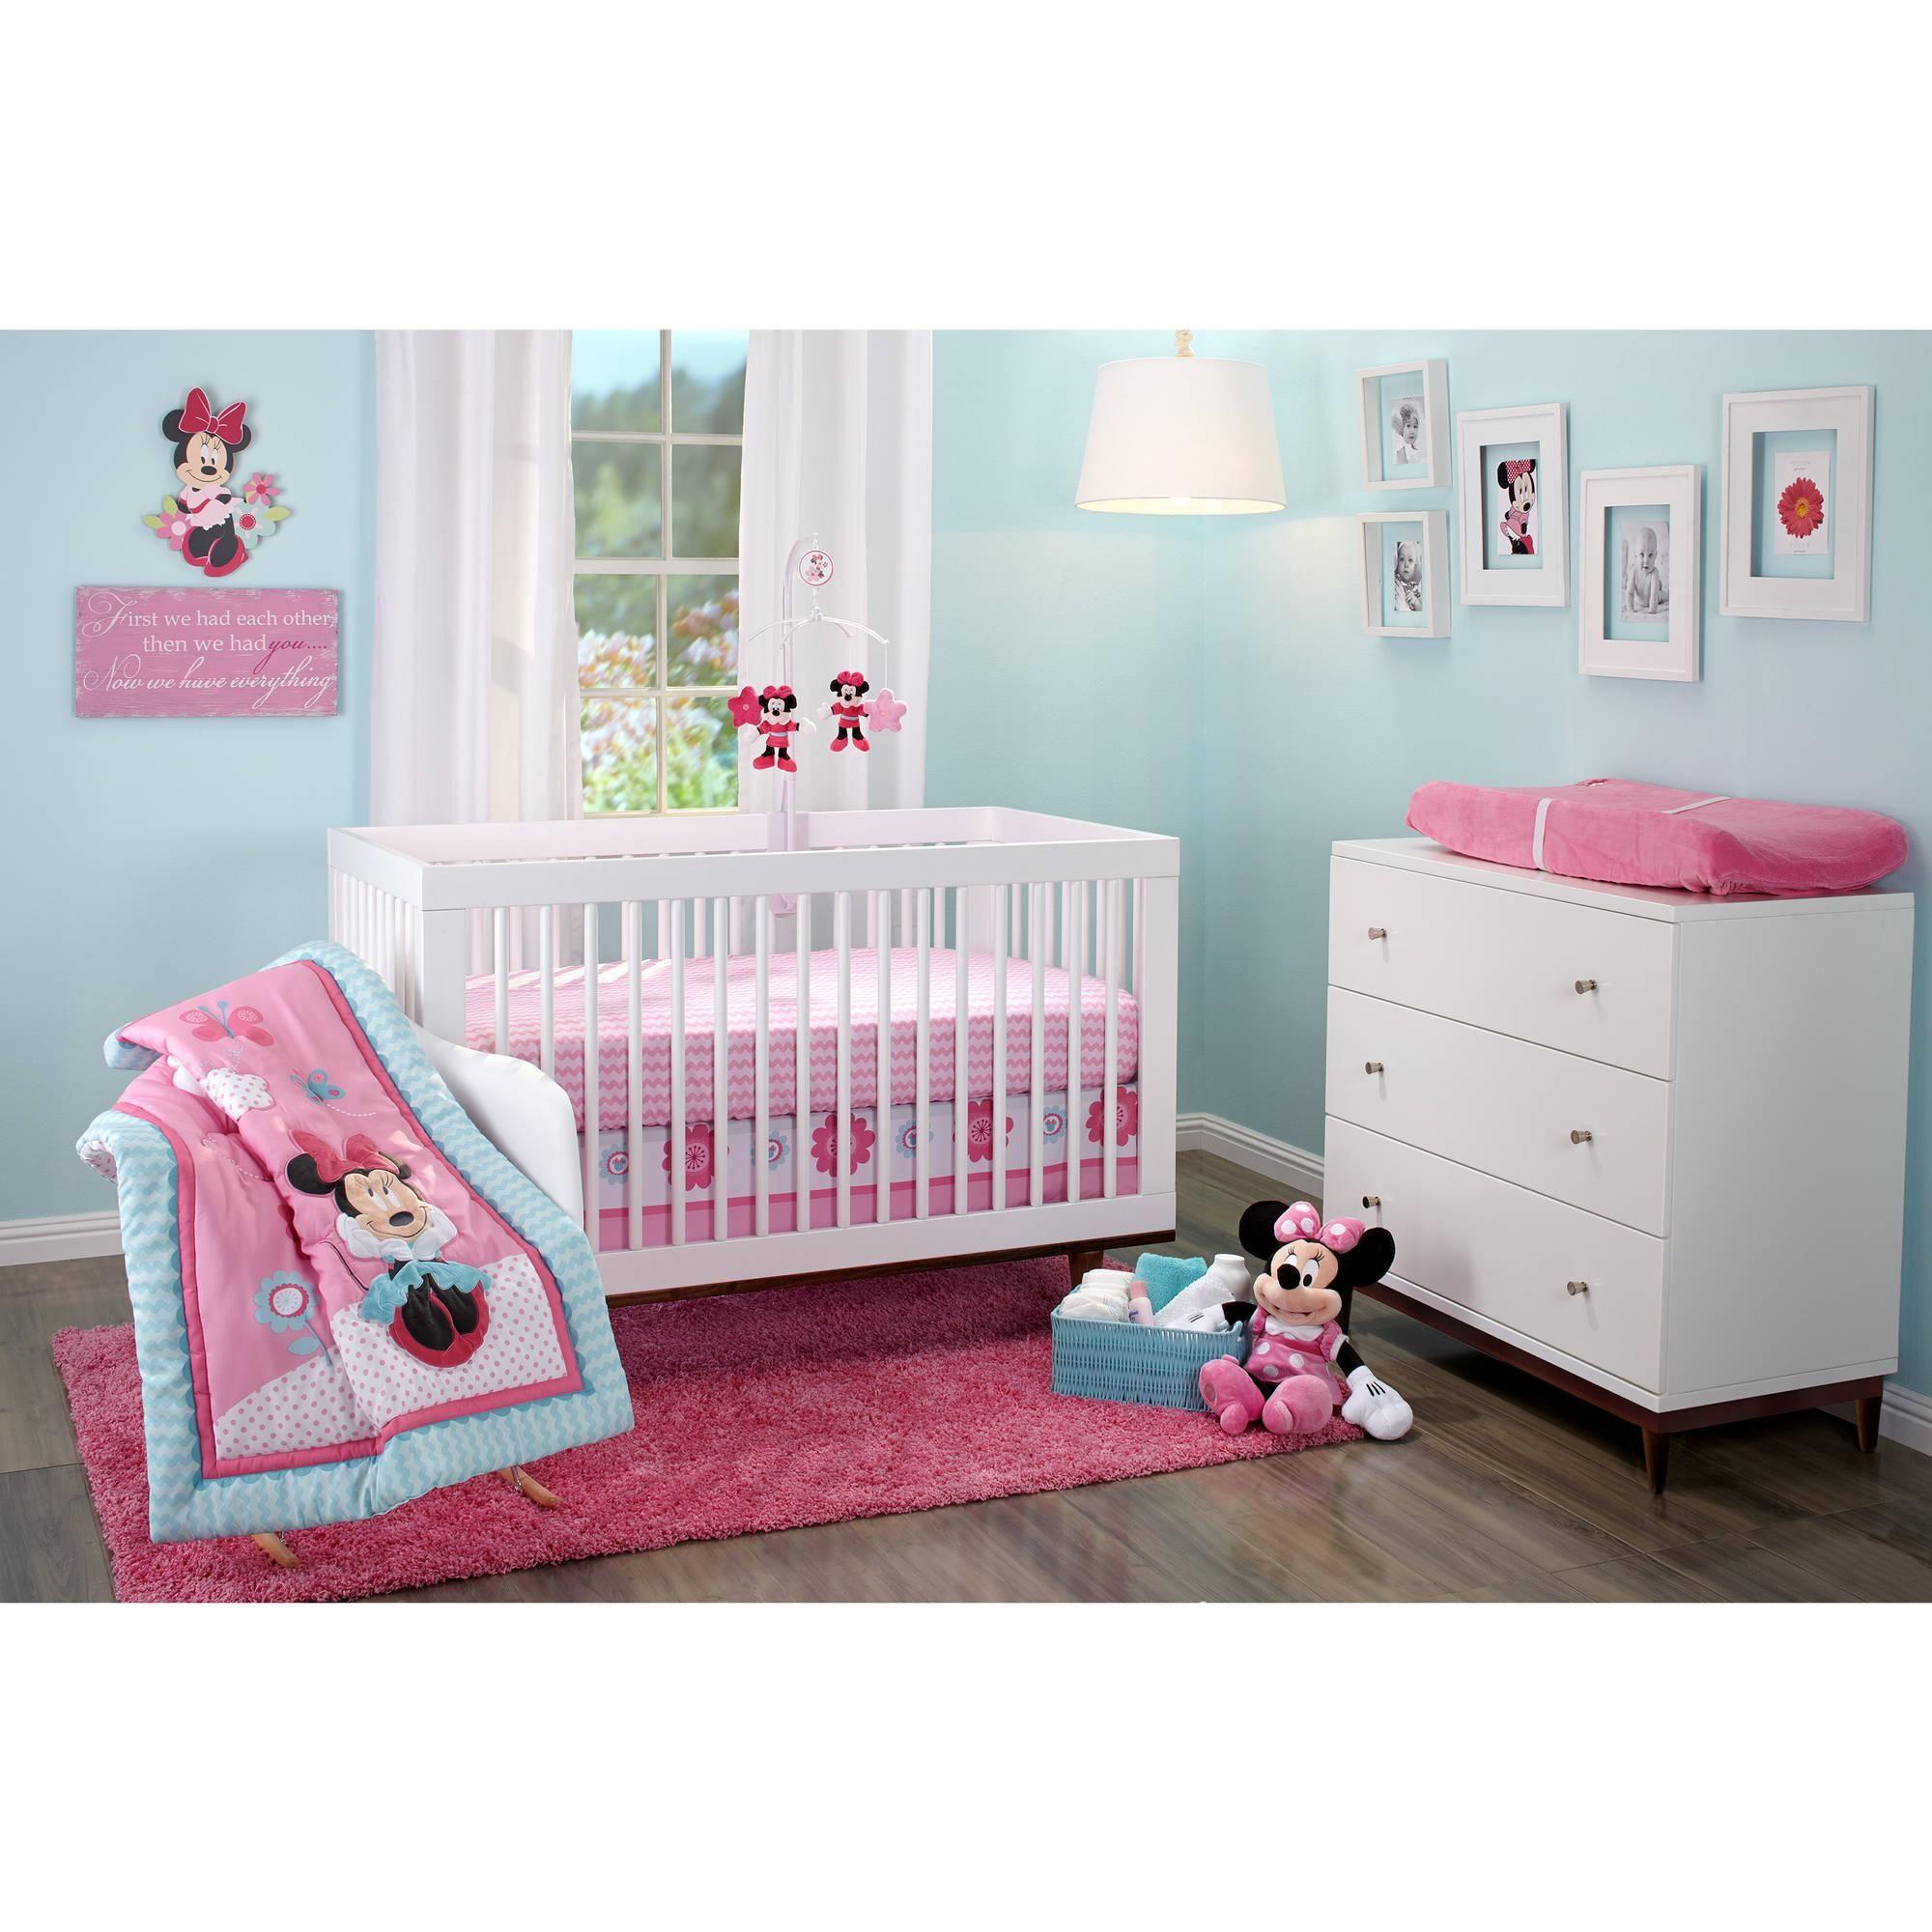 Baby Baby Bed Modern Baby Nursery Crib Bedding Sets